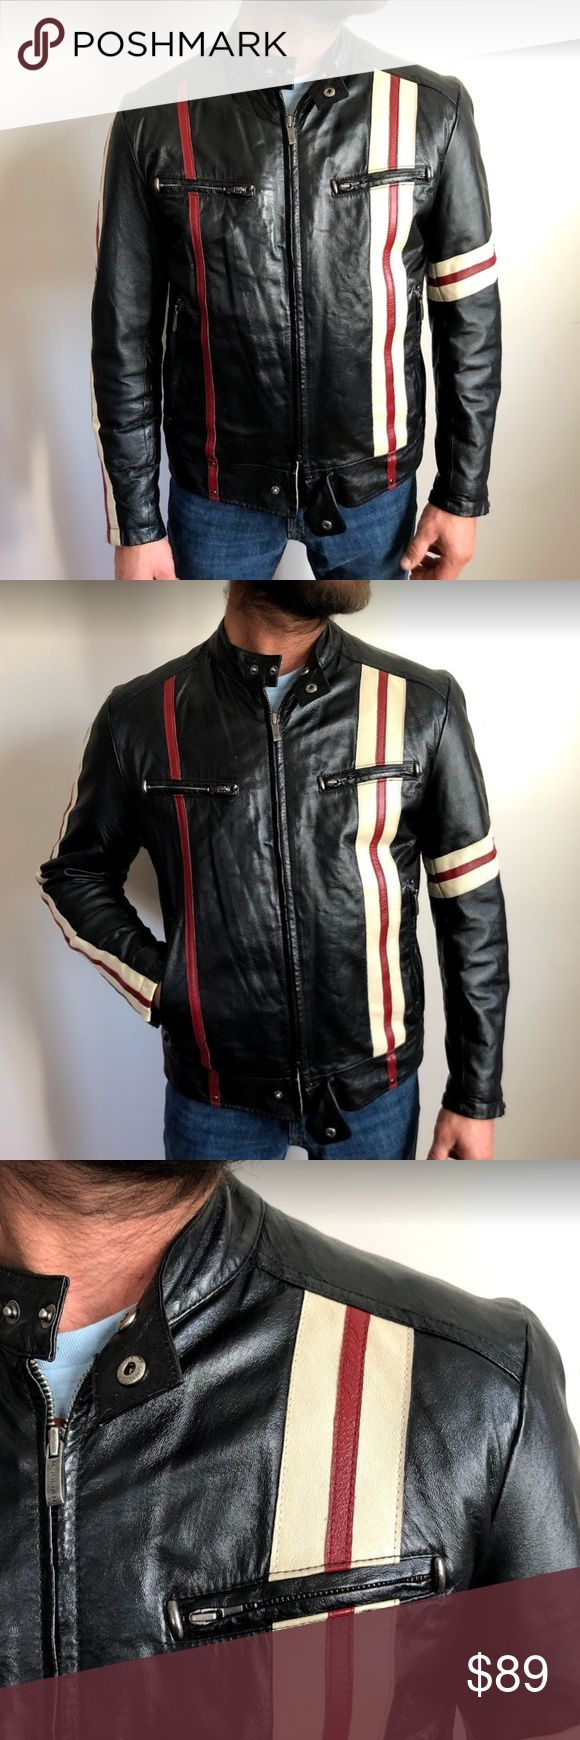 Wilsons Leather M. Julian Racer Moto Biker Jacket